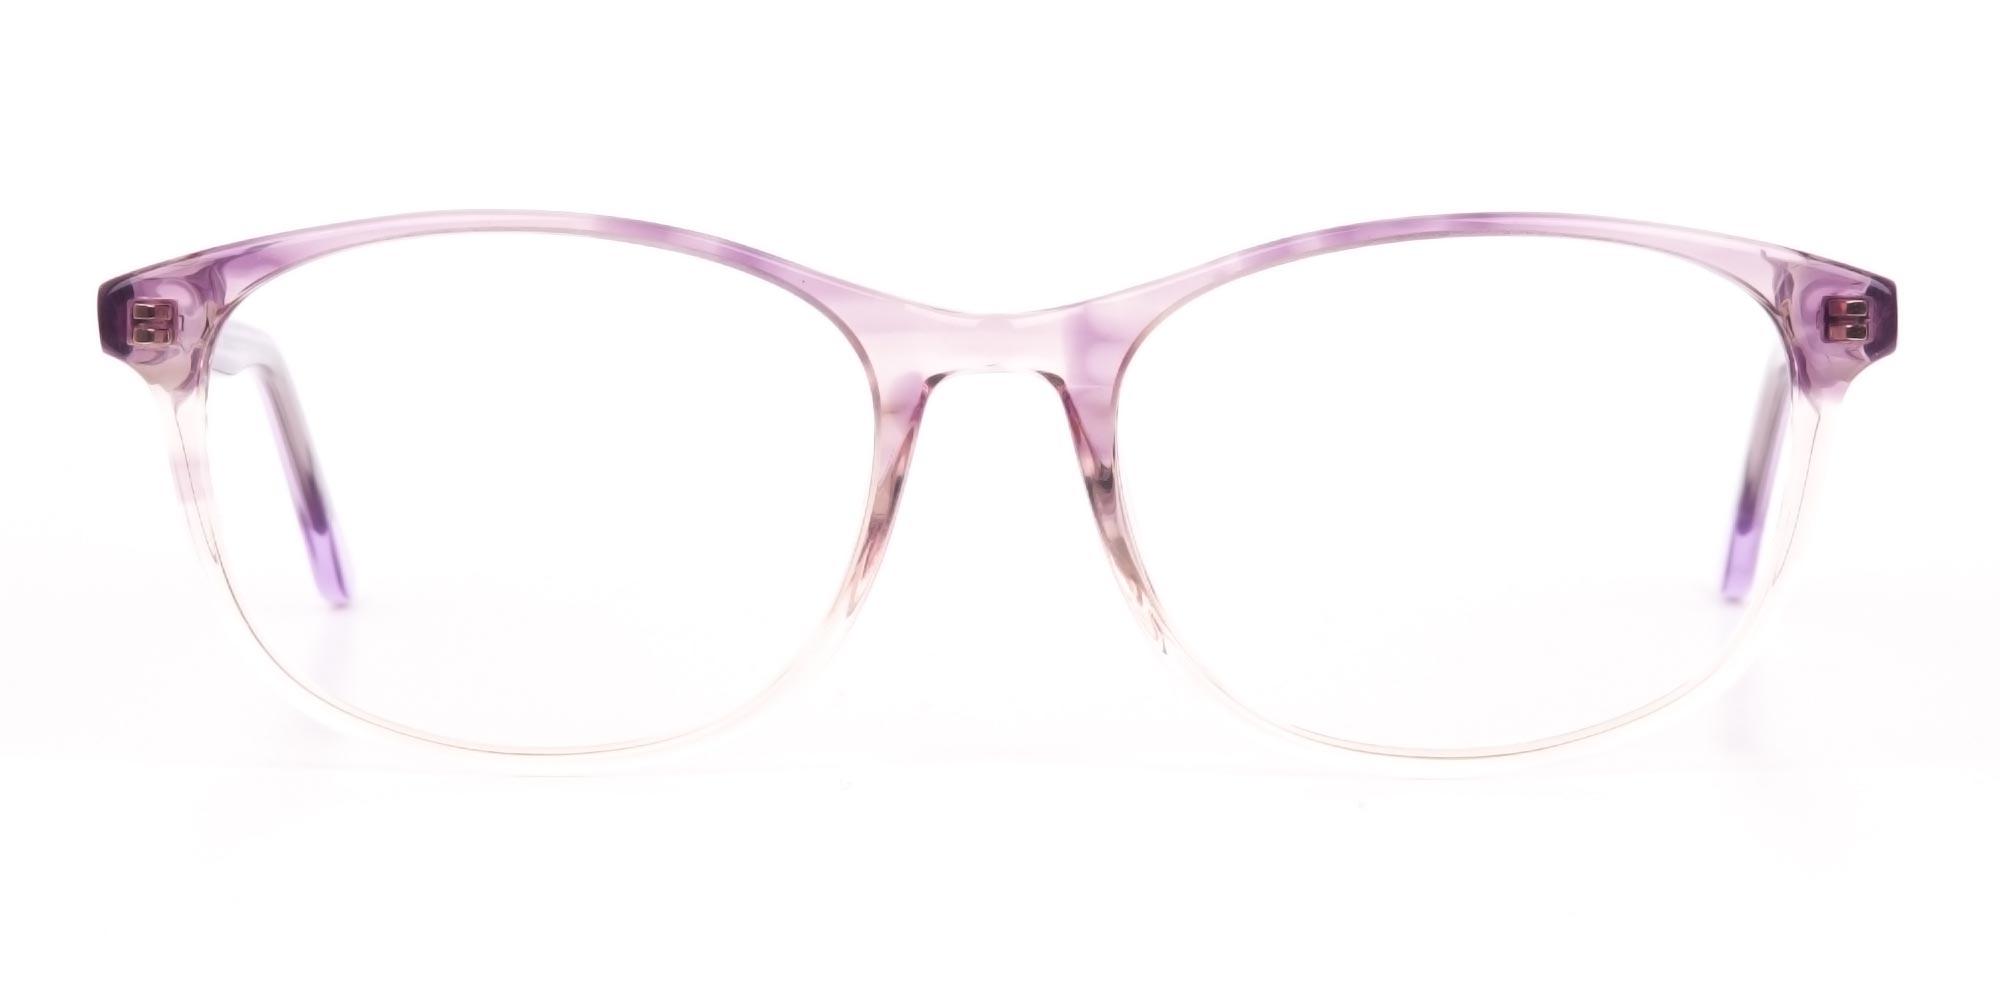 Crystal Purple Glasses Trends 2020